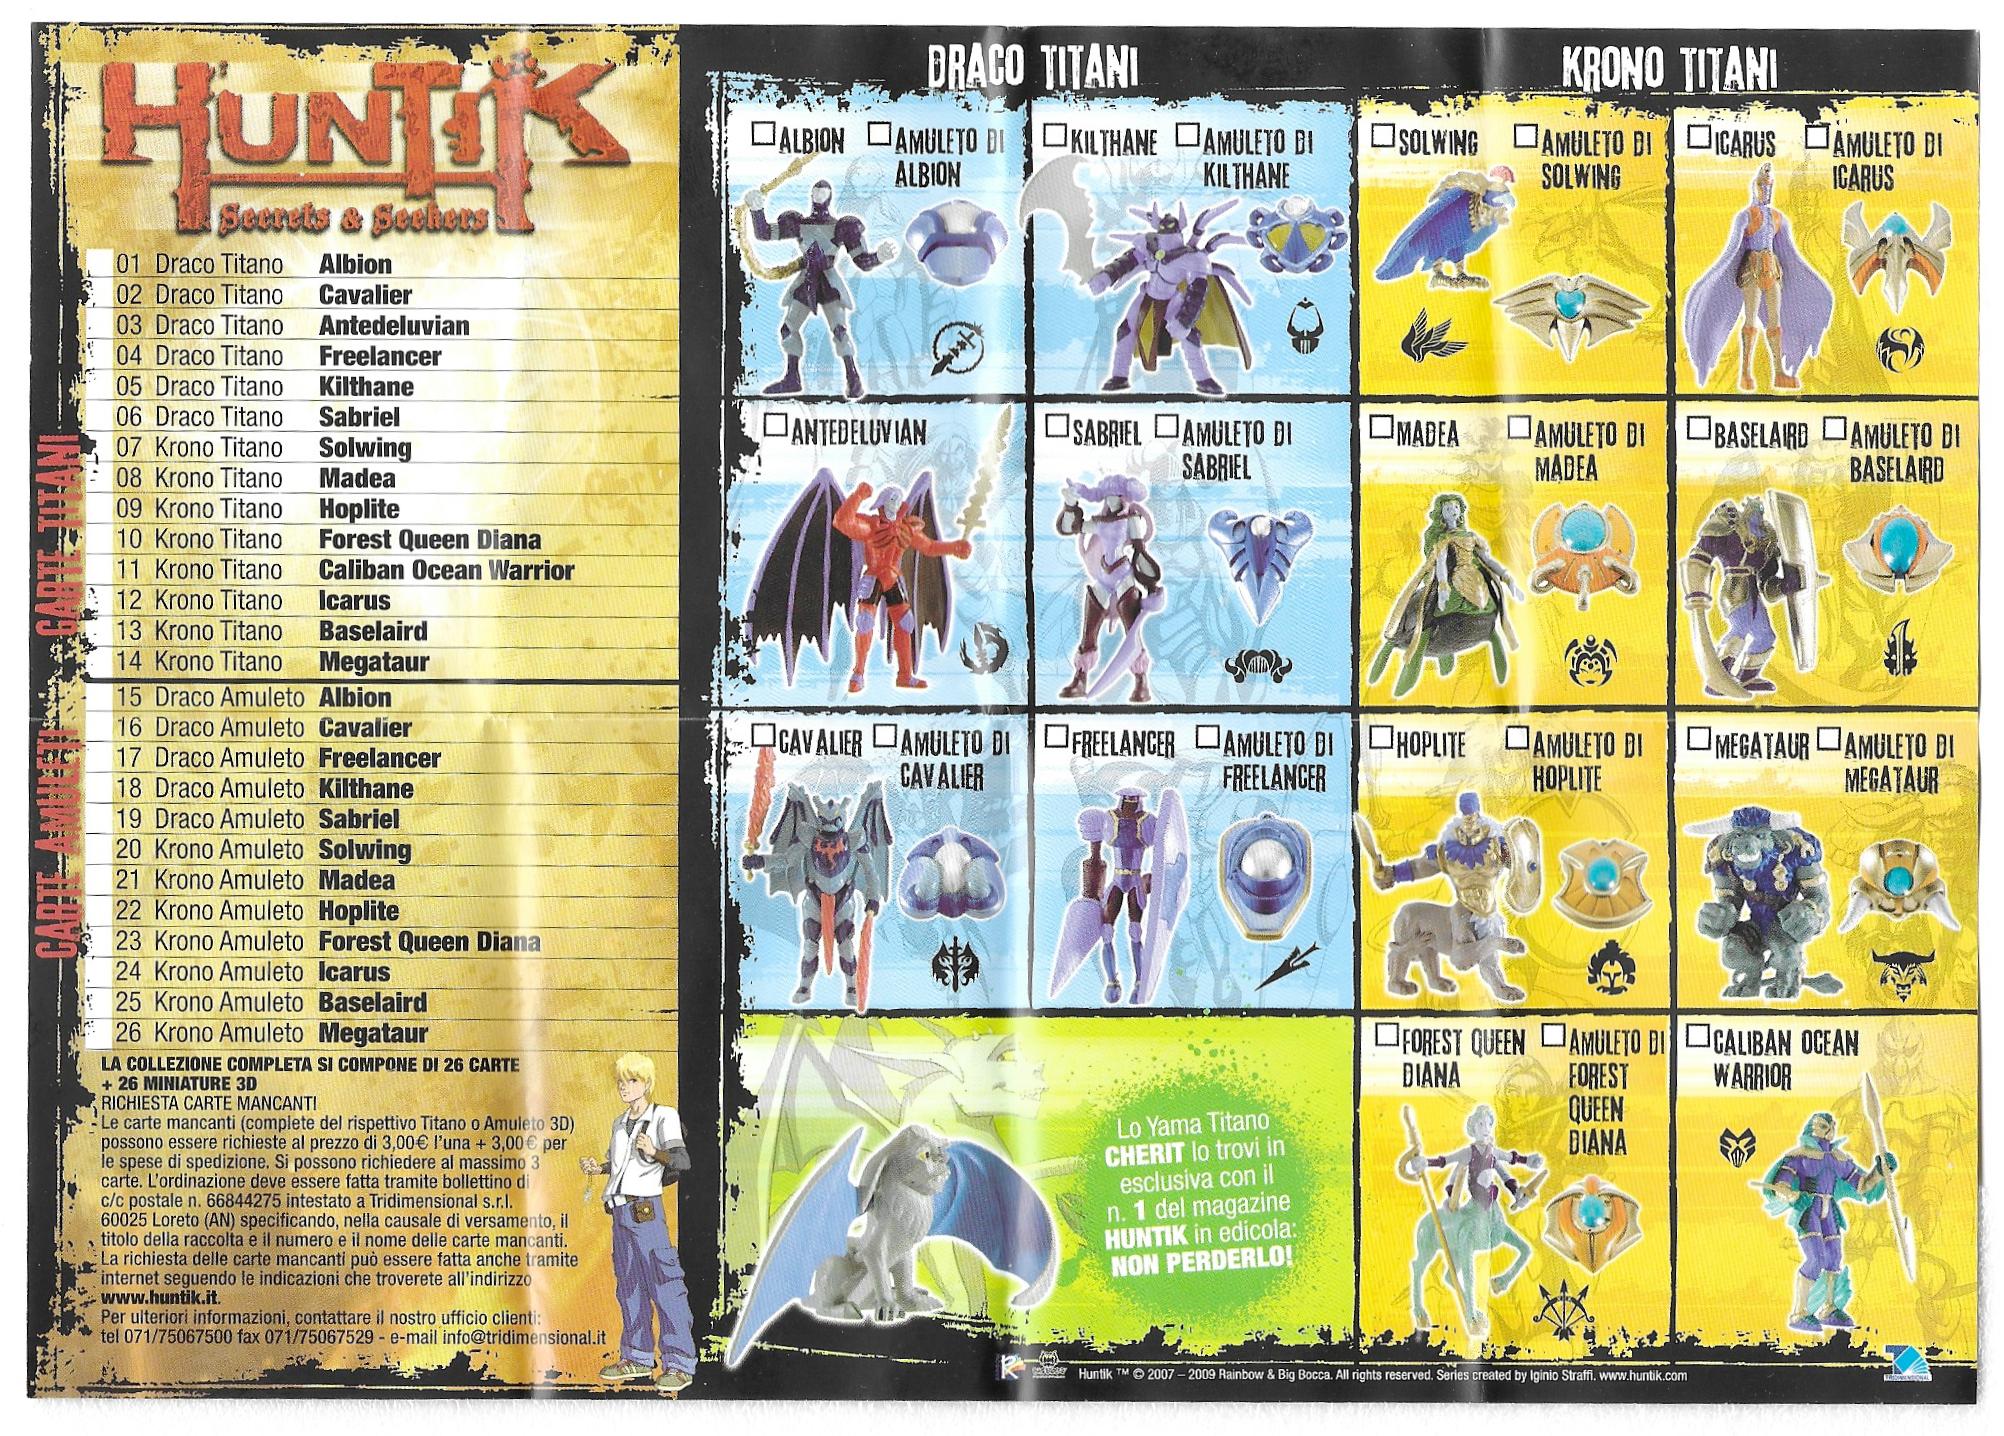 Huntik Panini Sheet S1.png